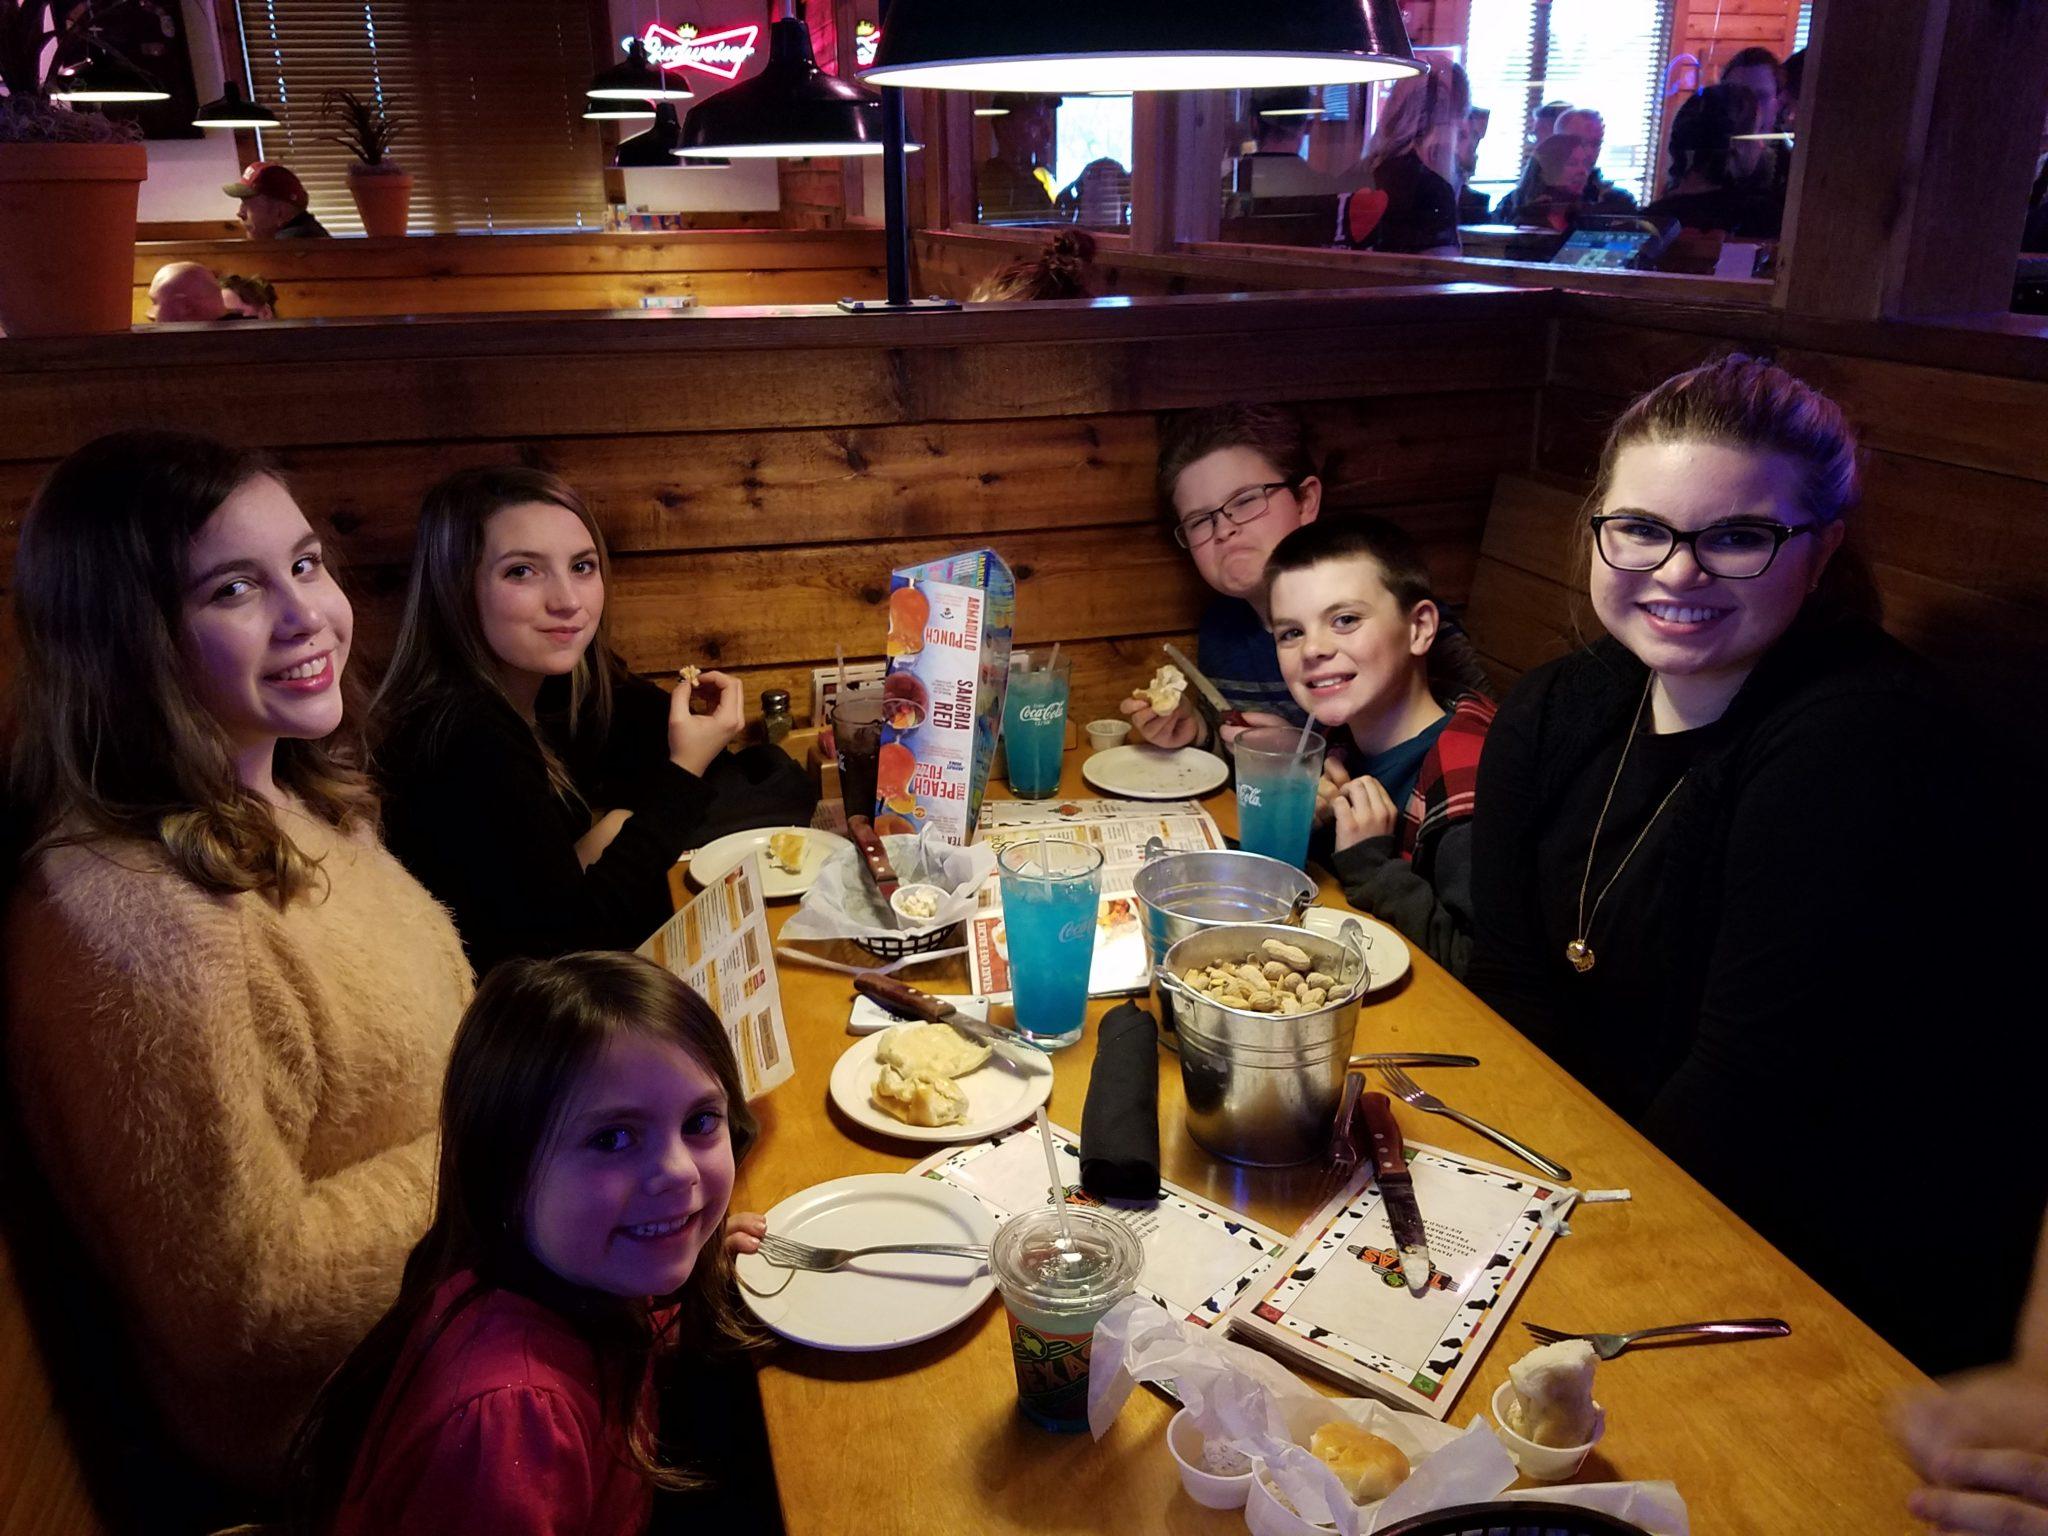 Restaurant Kids Eat Free